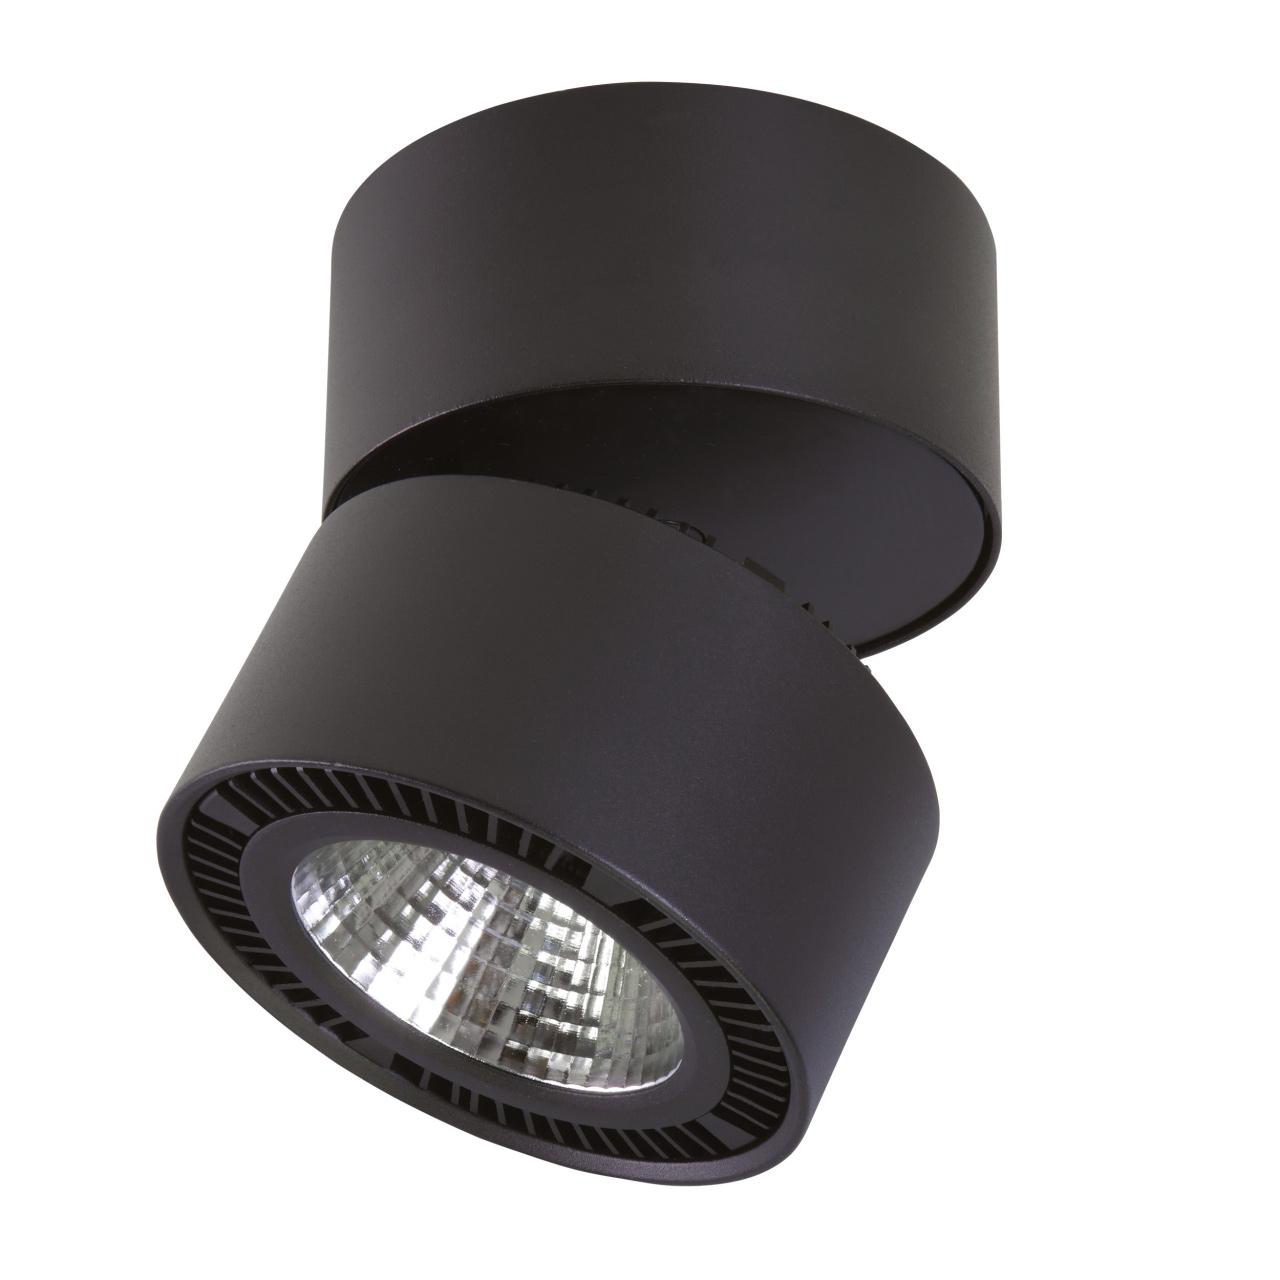 Светильник Forte Muro LED 26W 1950LM 30G черный 3000K Lightstar 213837